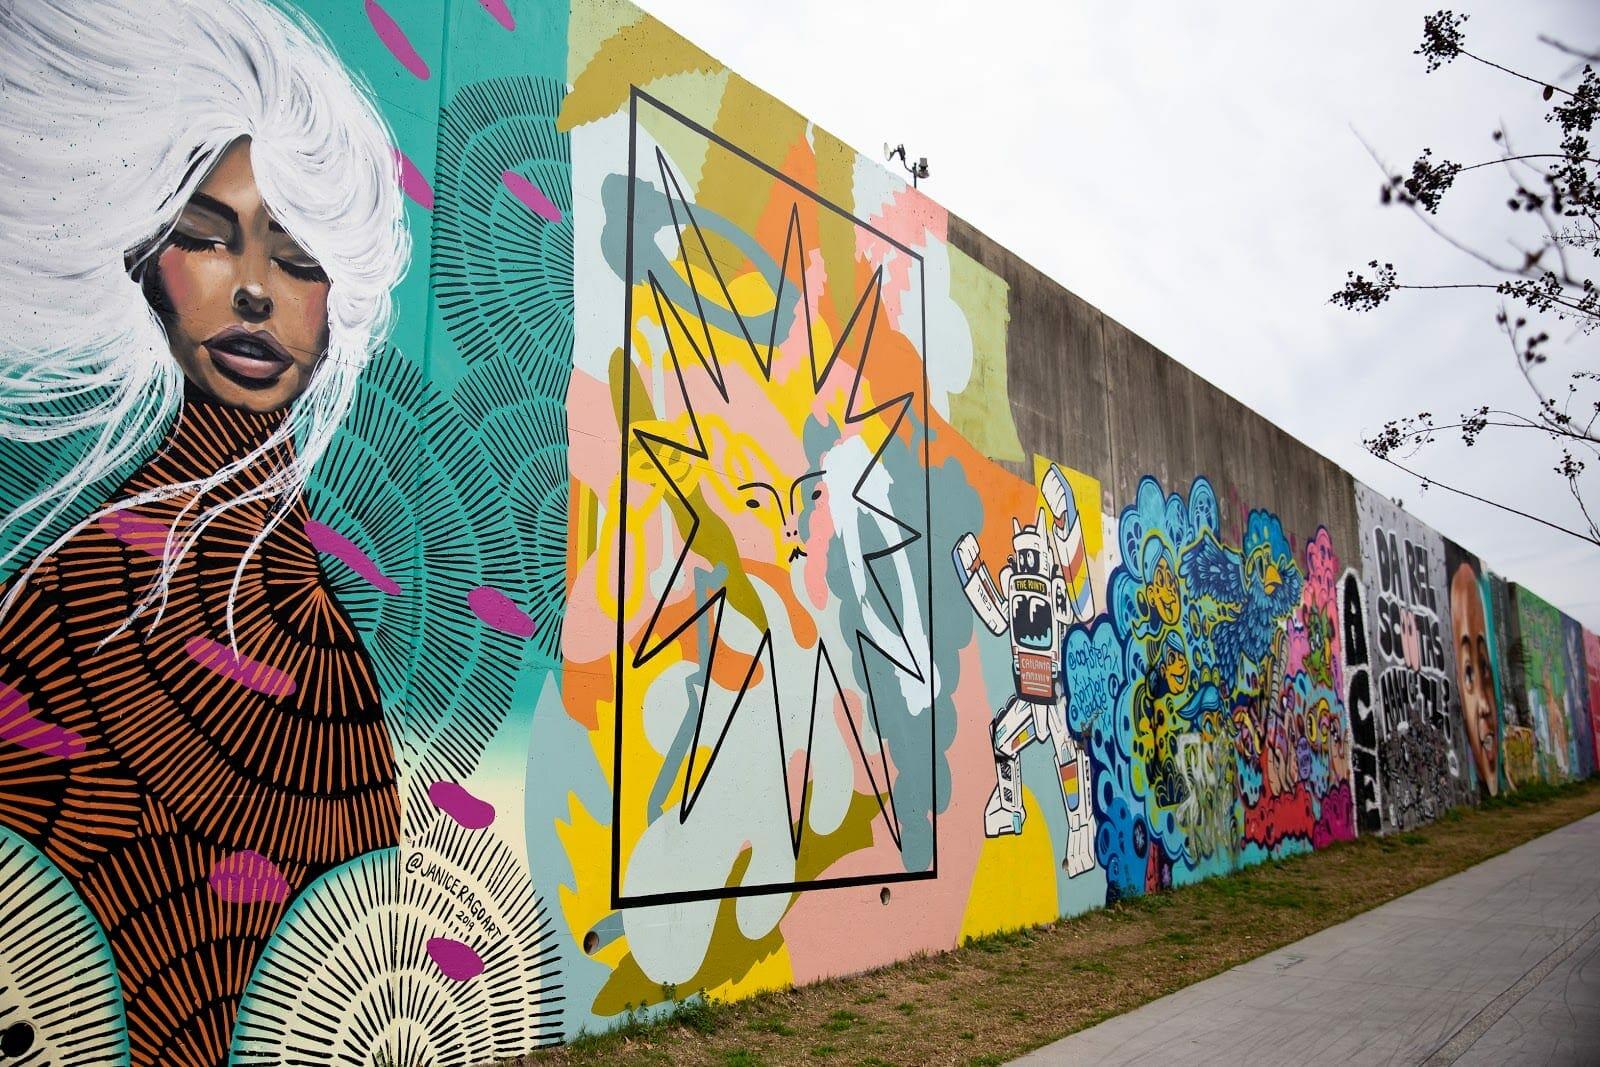 Forward Warrior murals in Cabbagetown.